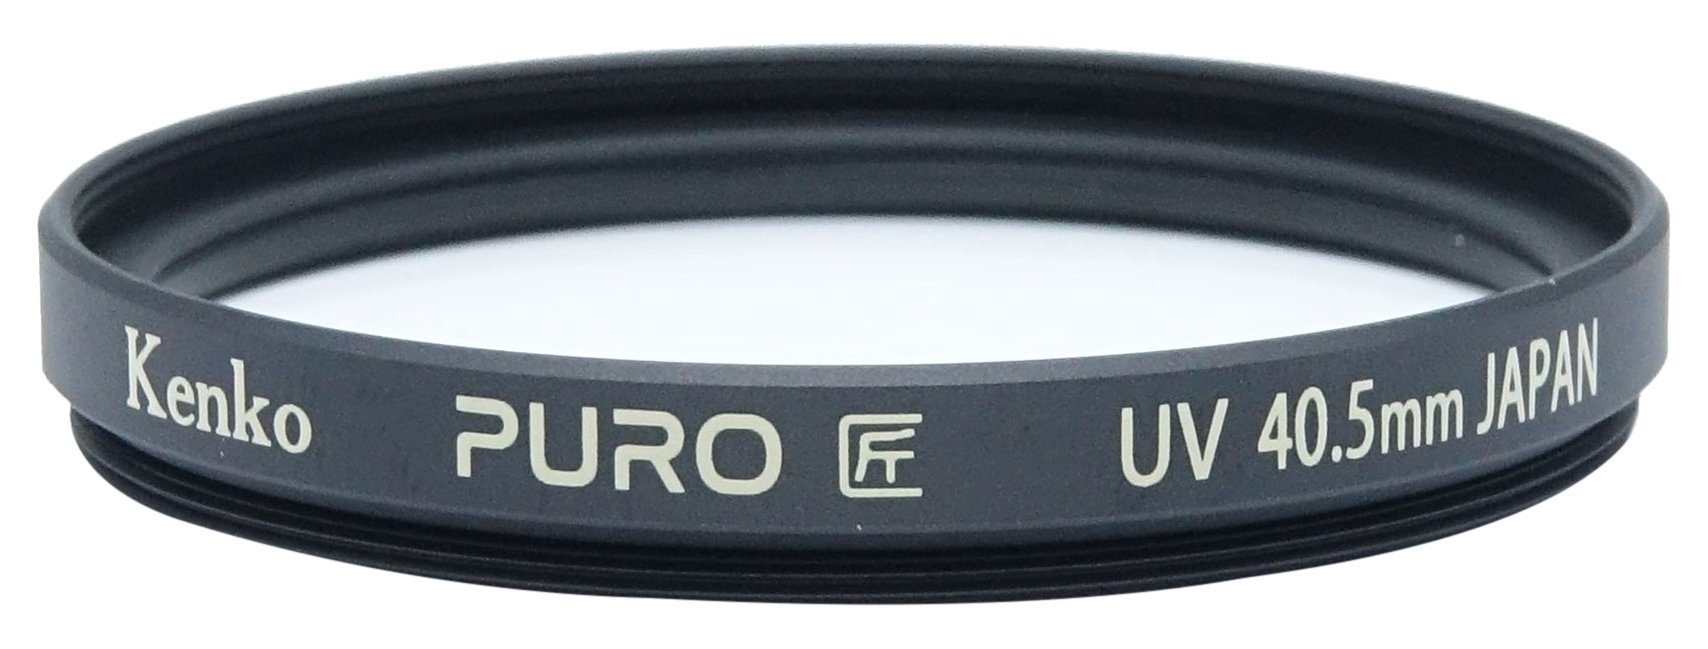 Kenko Puro Wide Angle Slim Ring 40.5mm Filtro UV multicapa